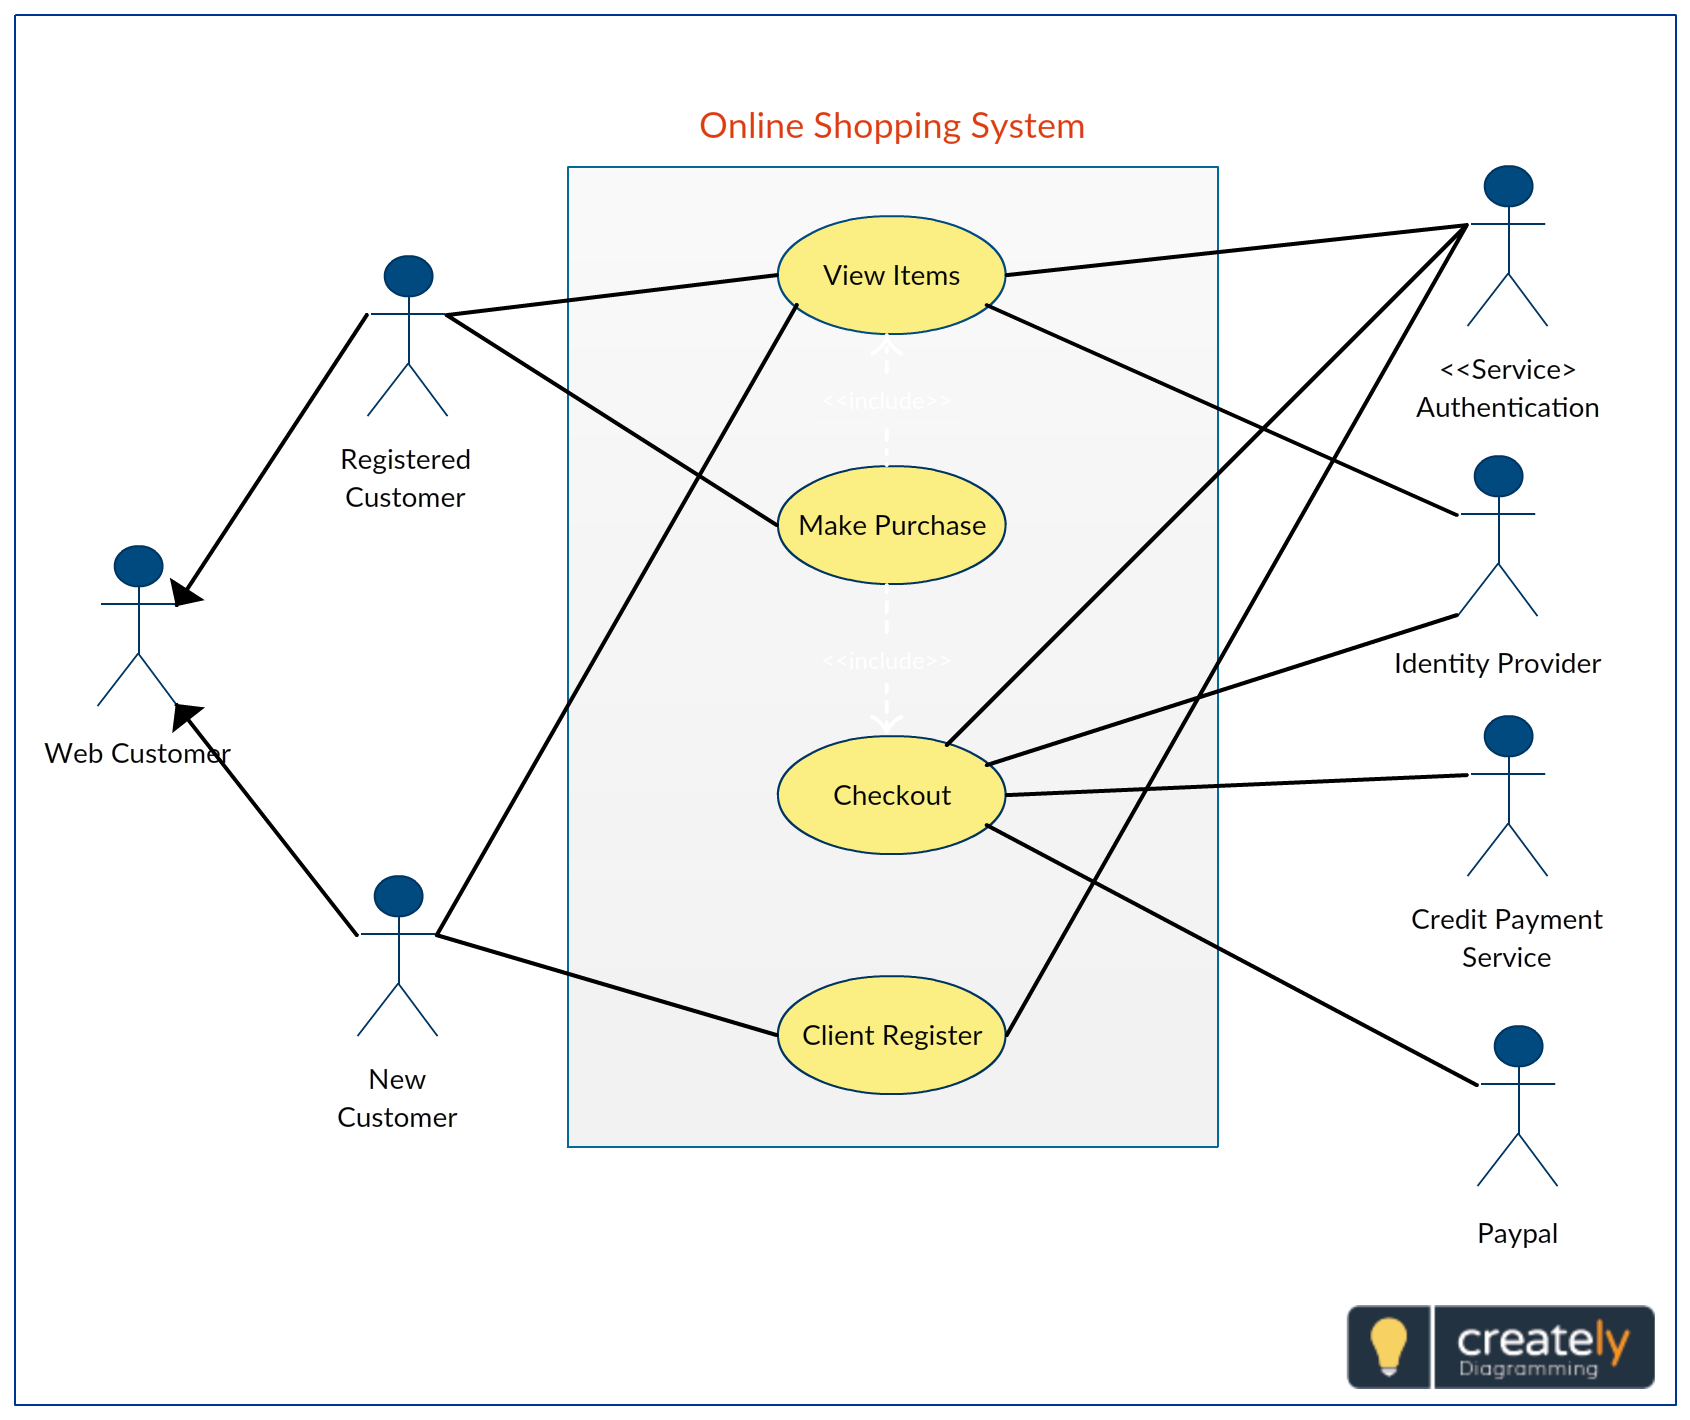 a use case diagram uml showing online shopping system actors a use case diagram [ 1690 x 1420 Pixel ]